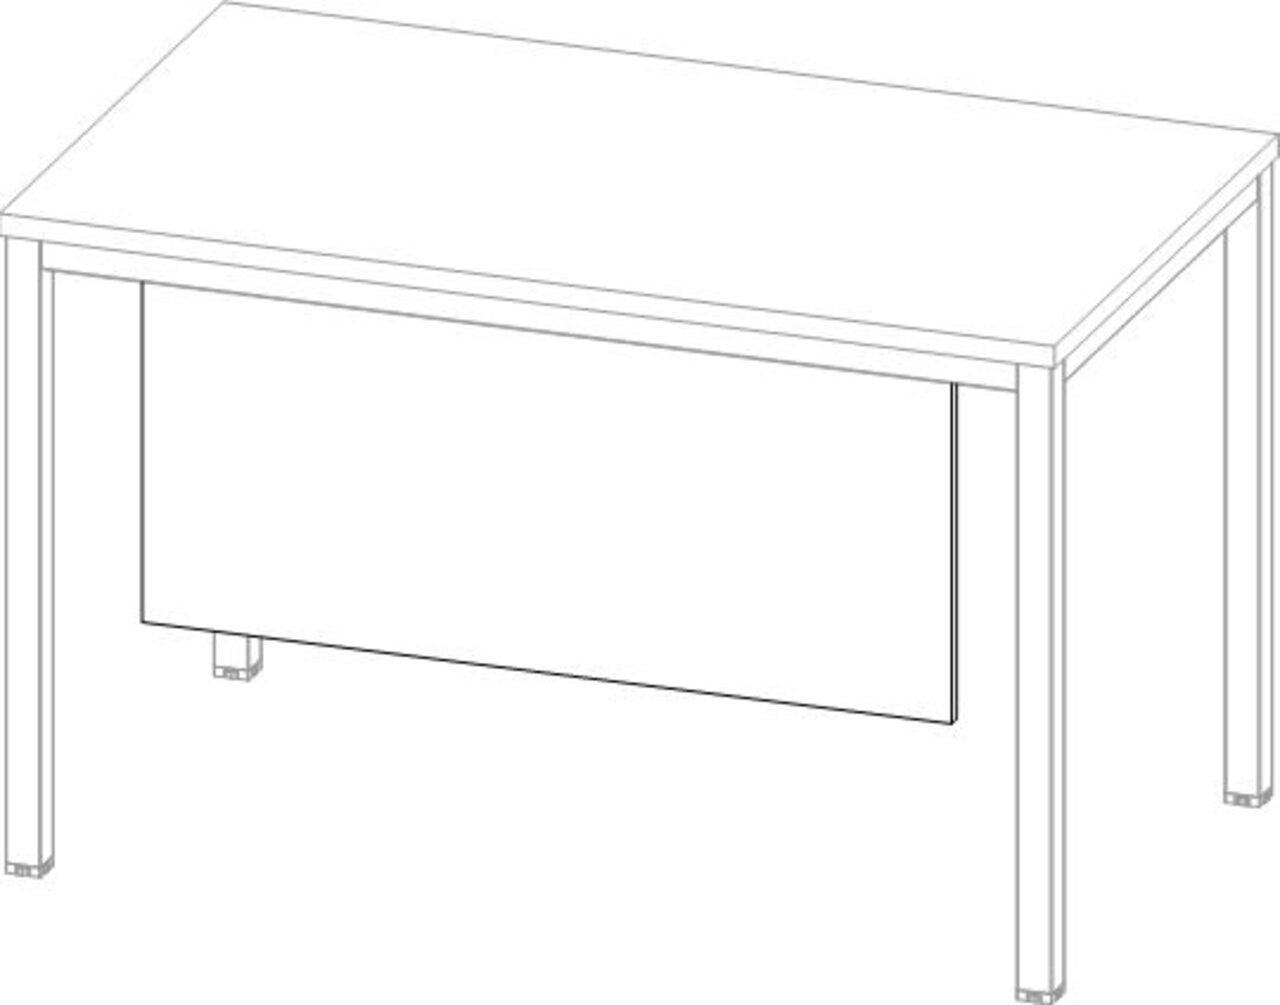 Царга к столу - фото 1